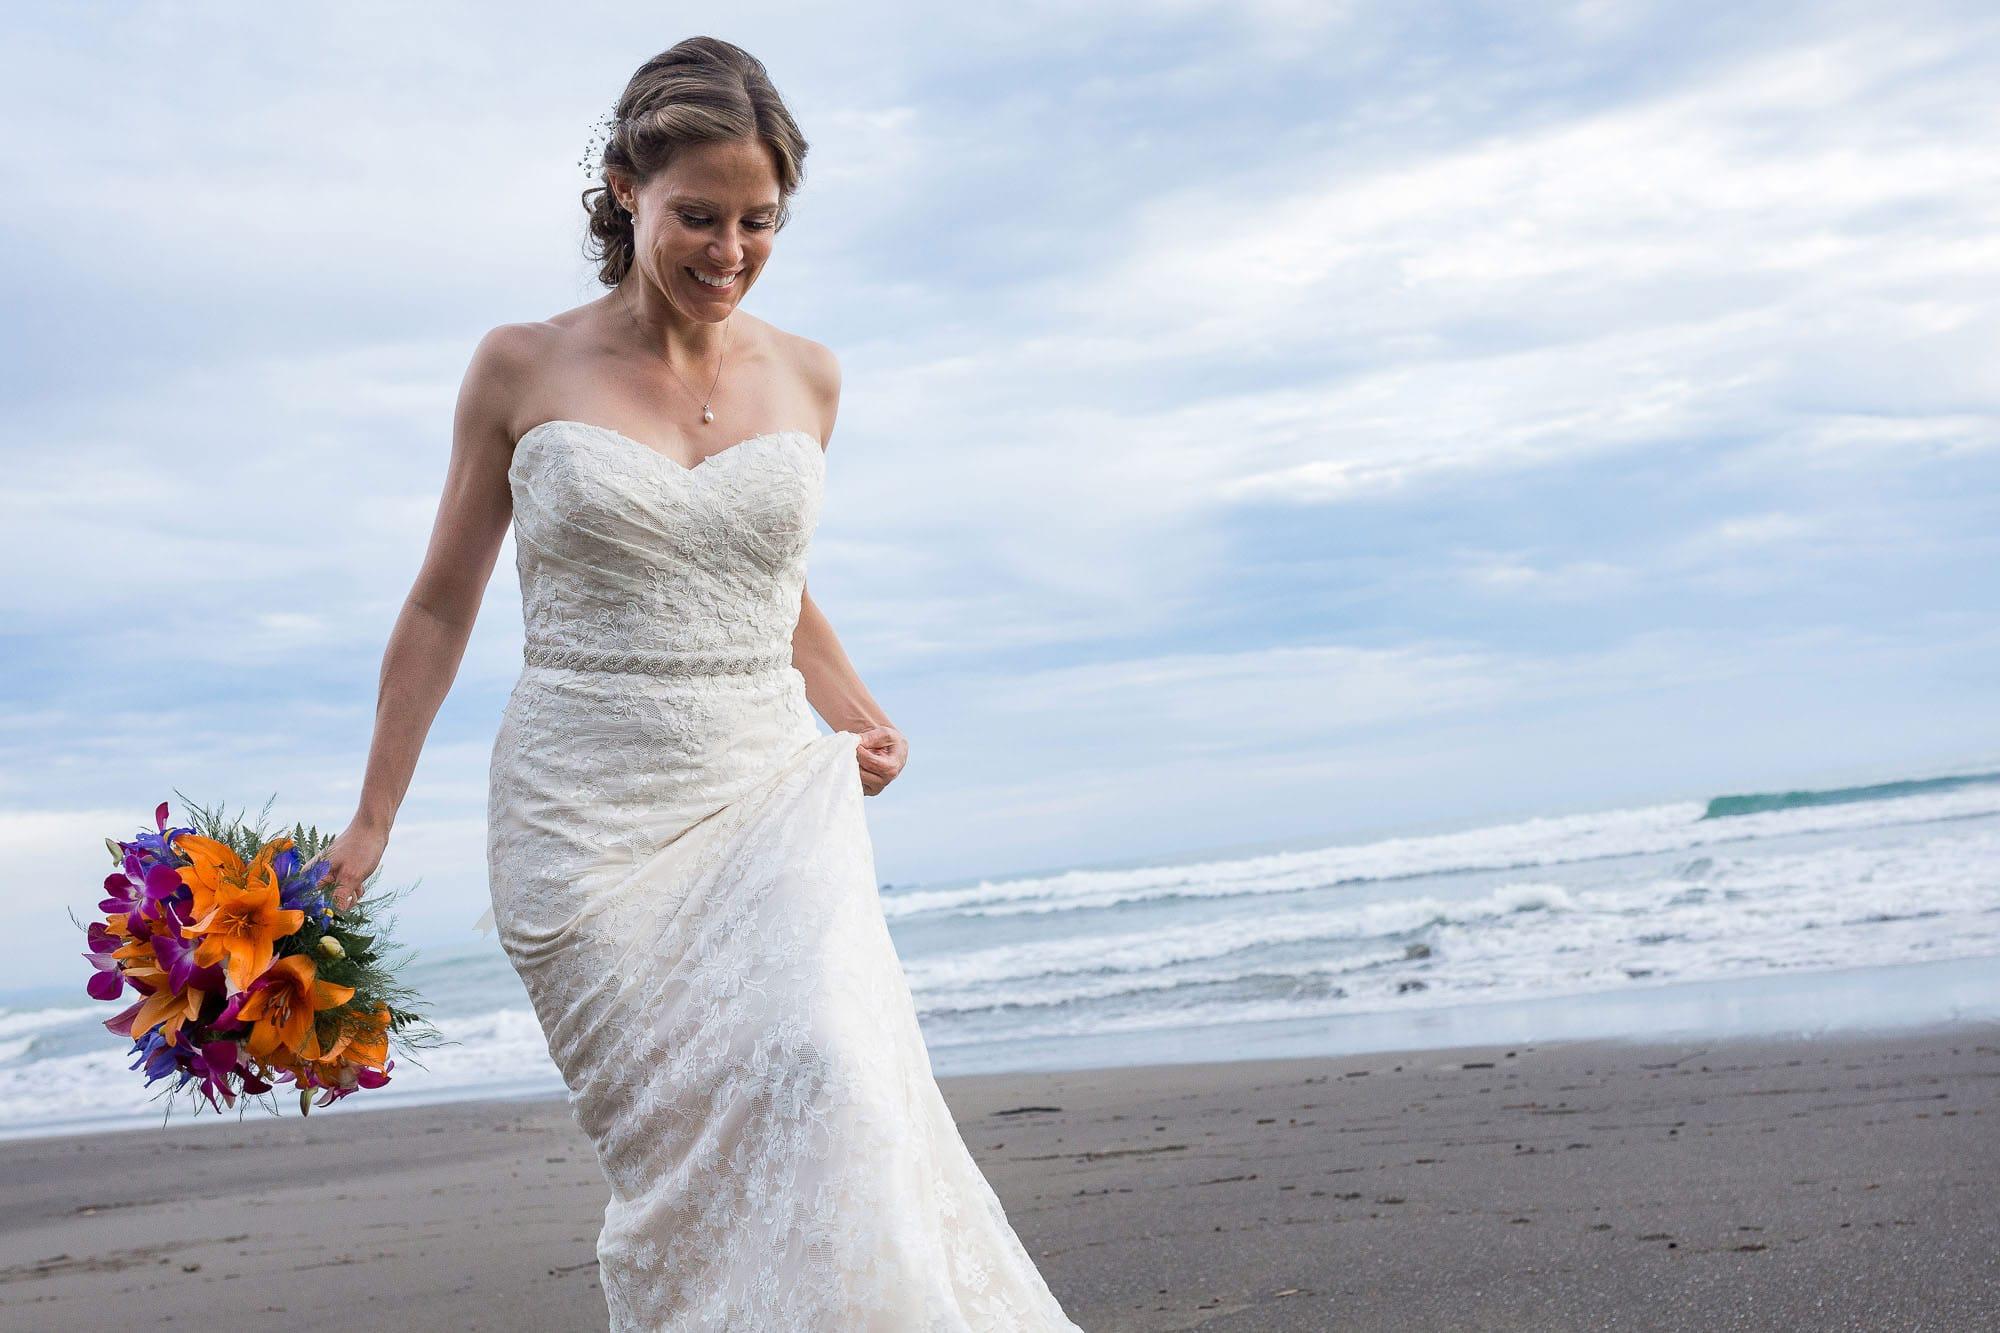 The bride on the beach with blue skies peeking through